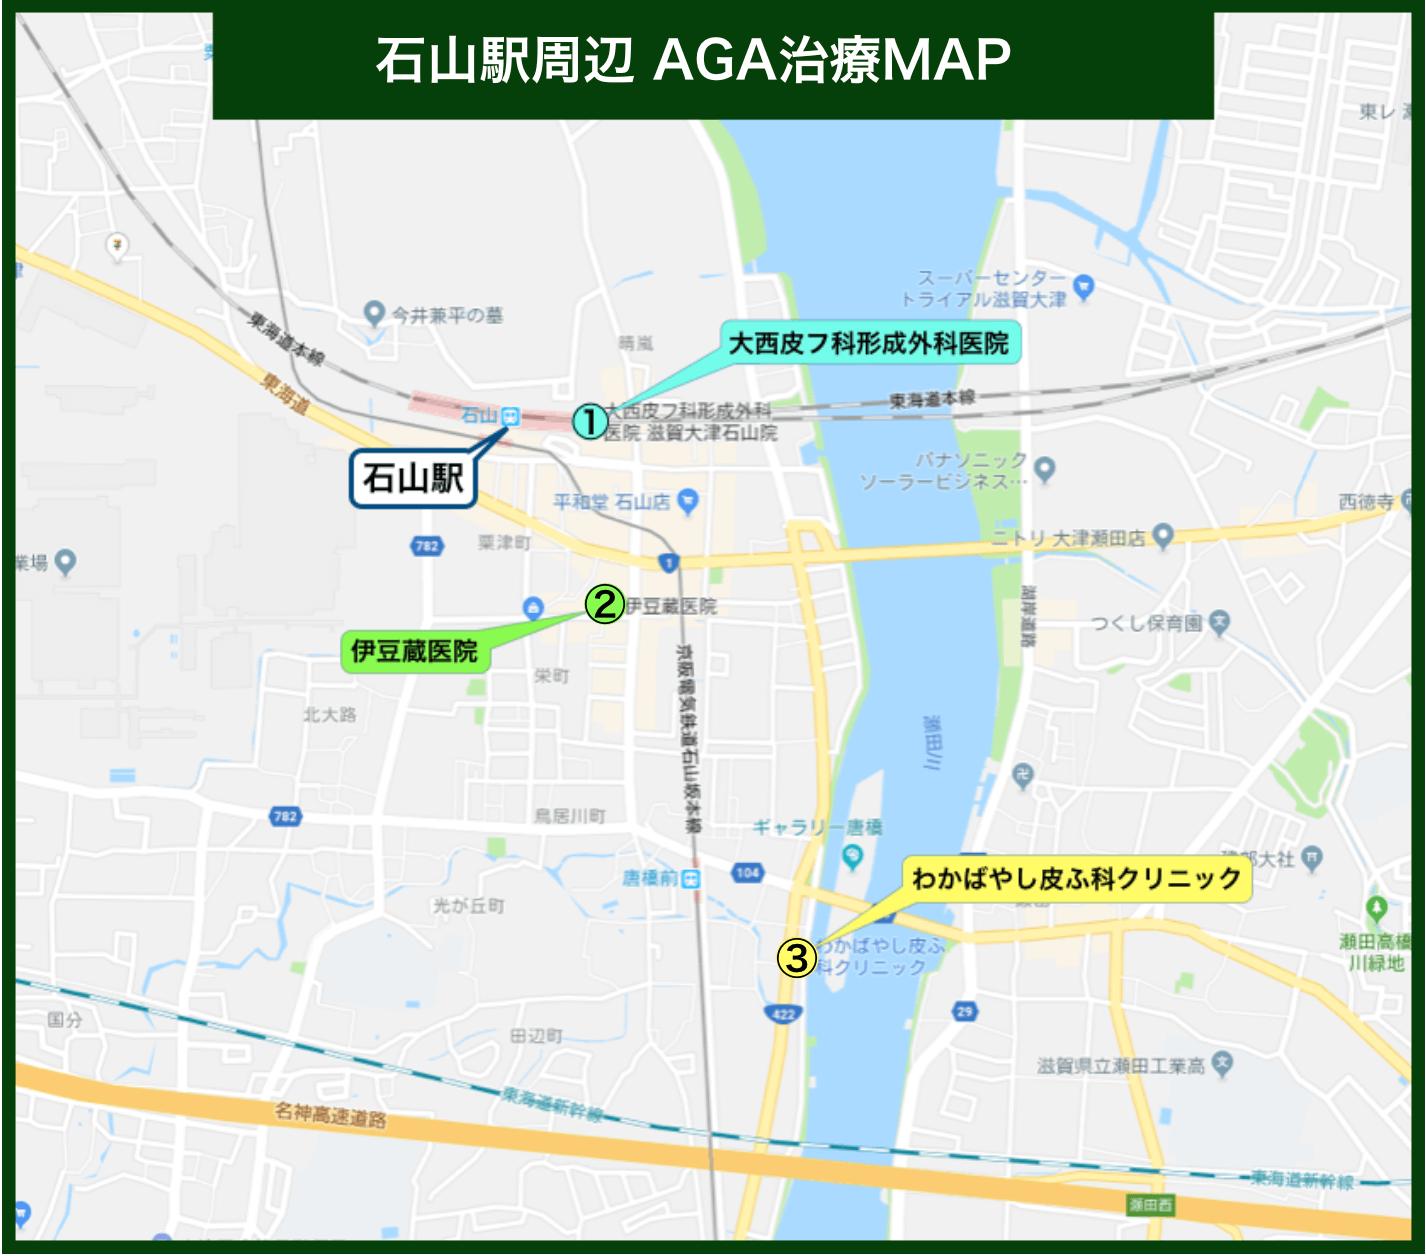 石山駅周辺 AGA治療MAP